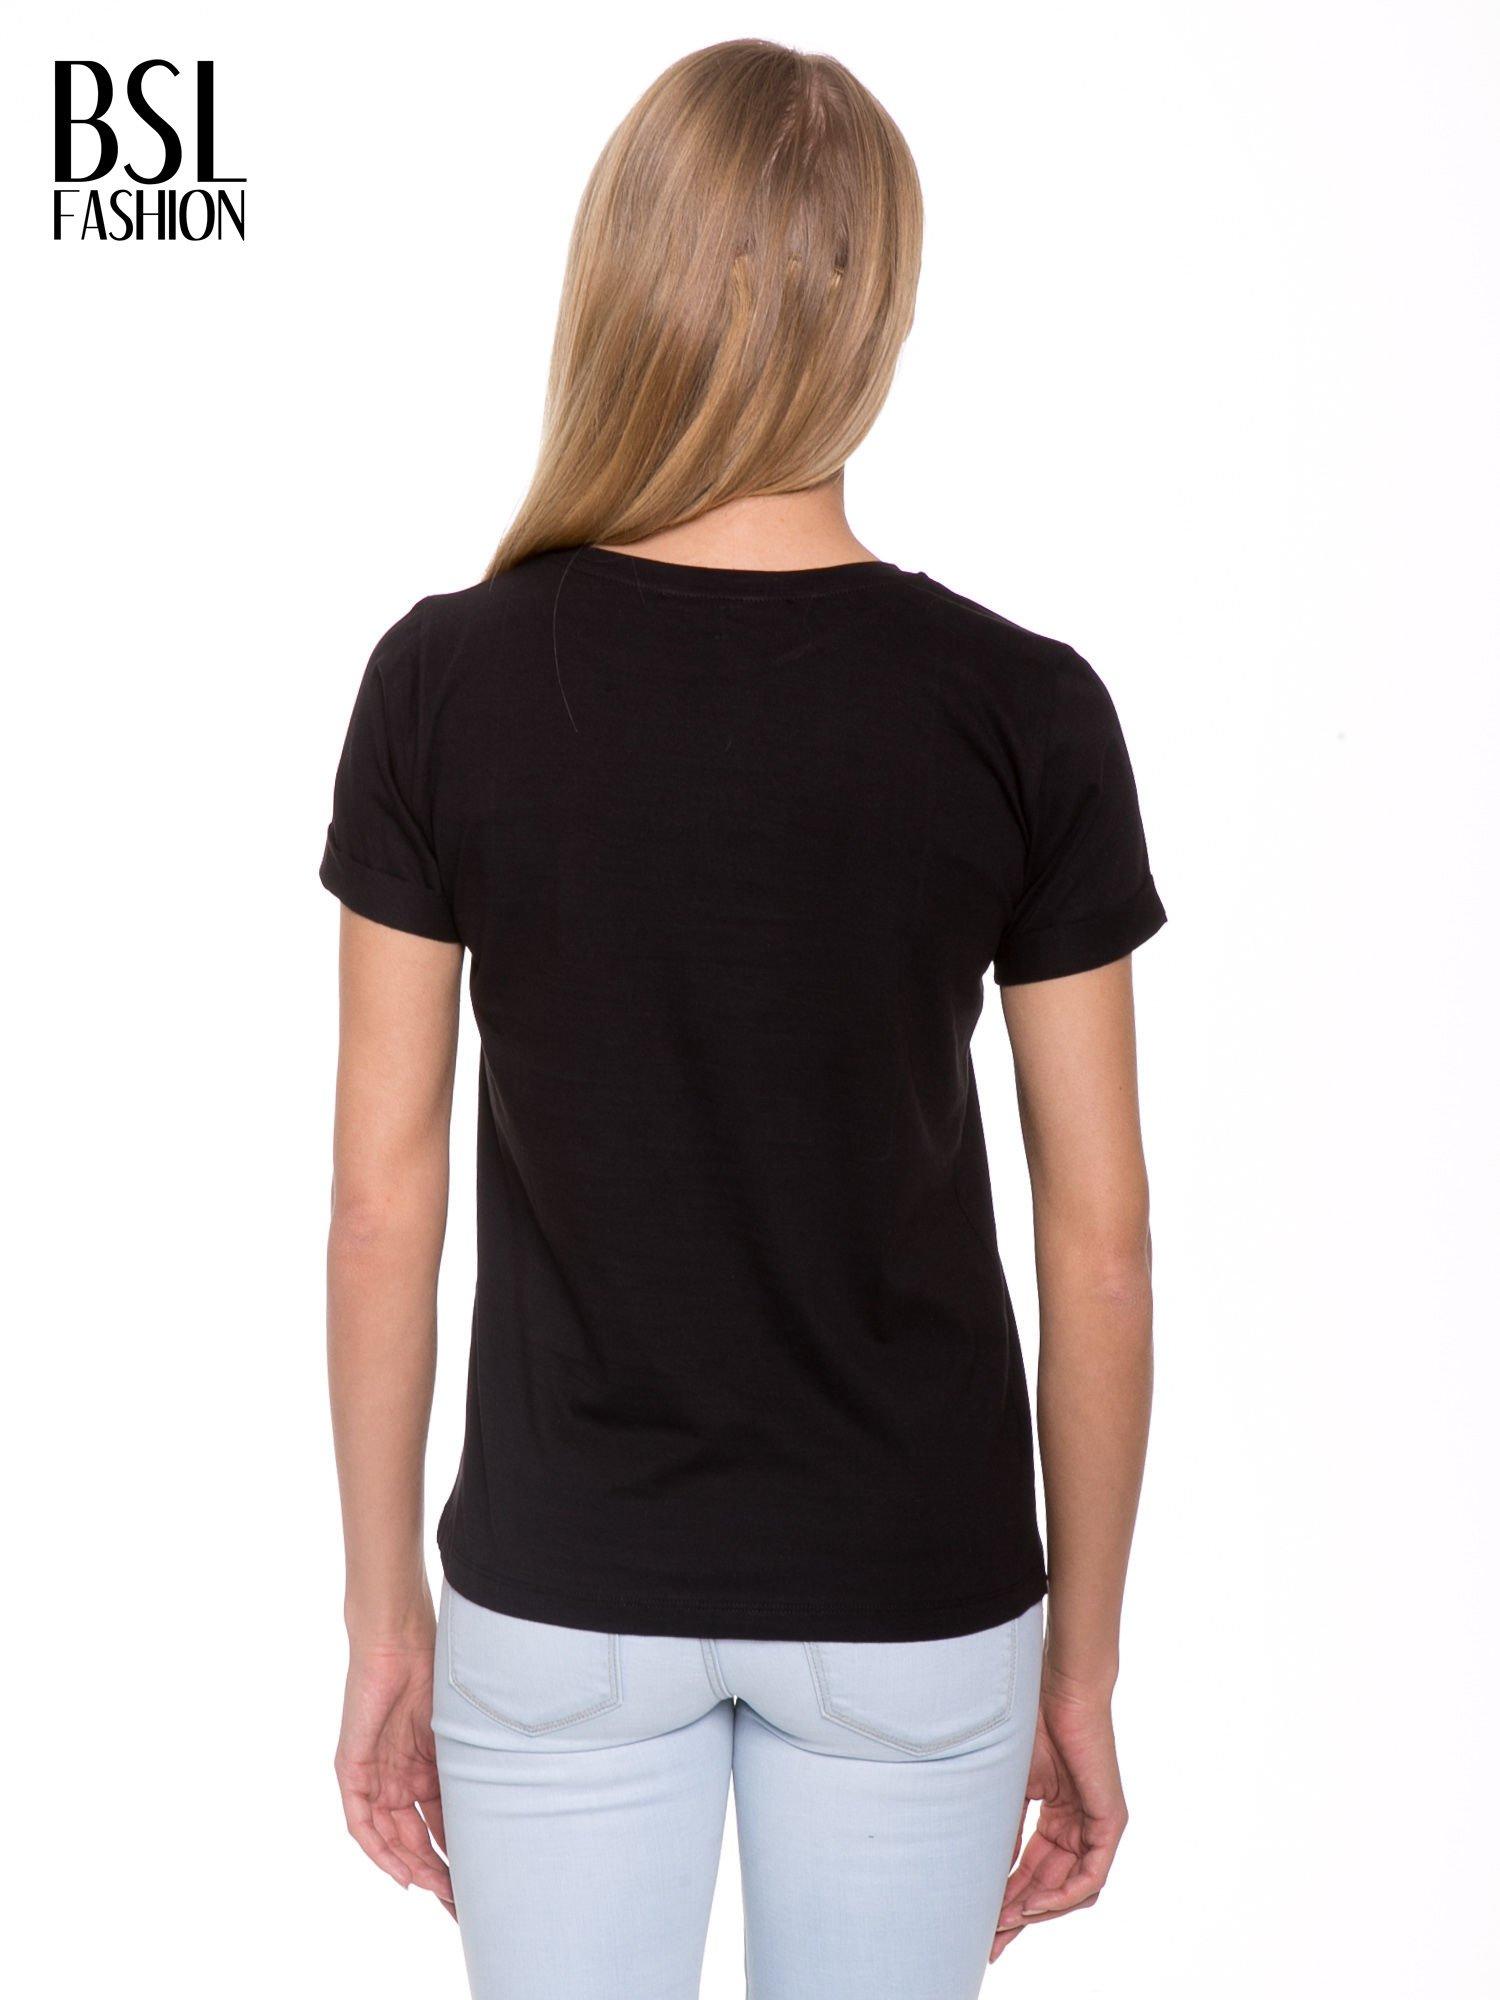 Czarny t-shirt z napisem FUCK z logo Chanel                                  zdj.                                  4